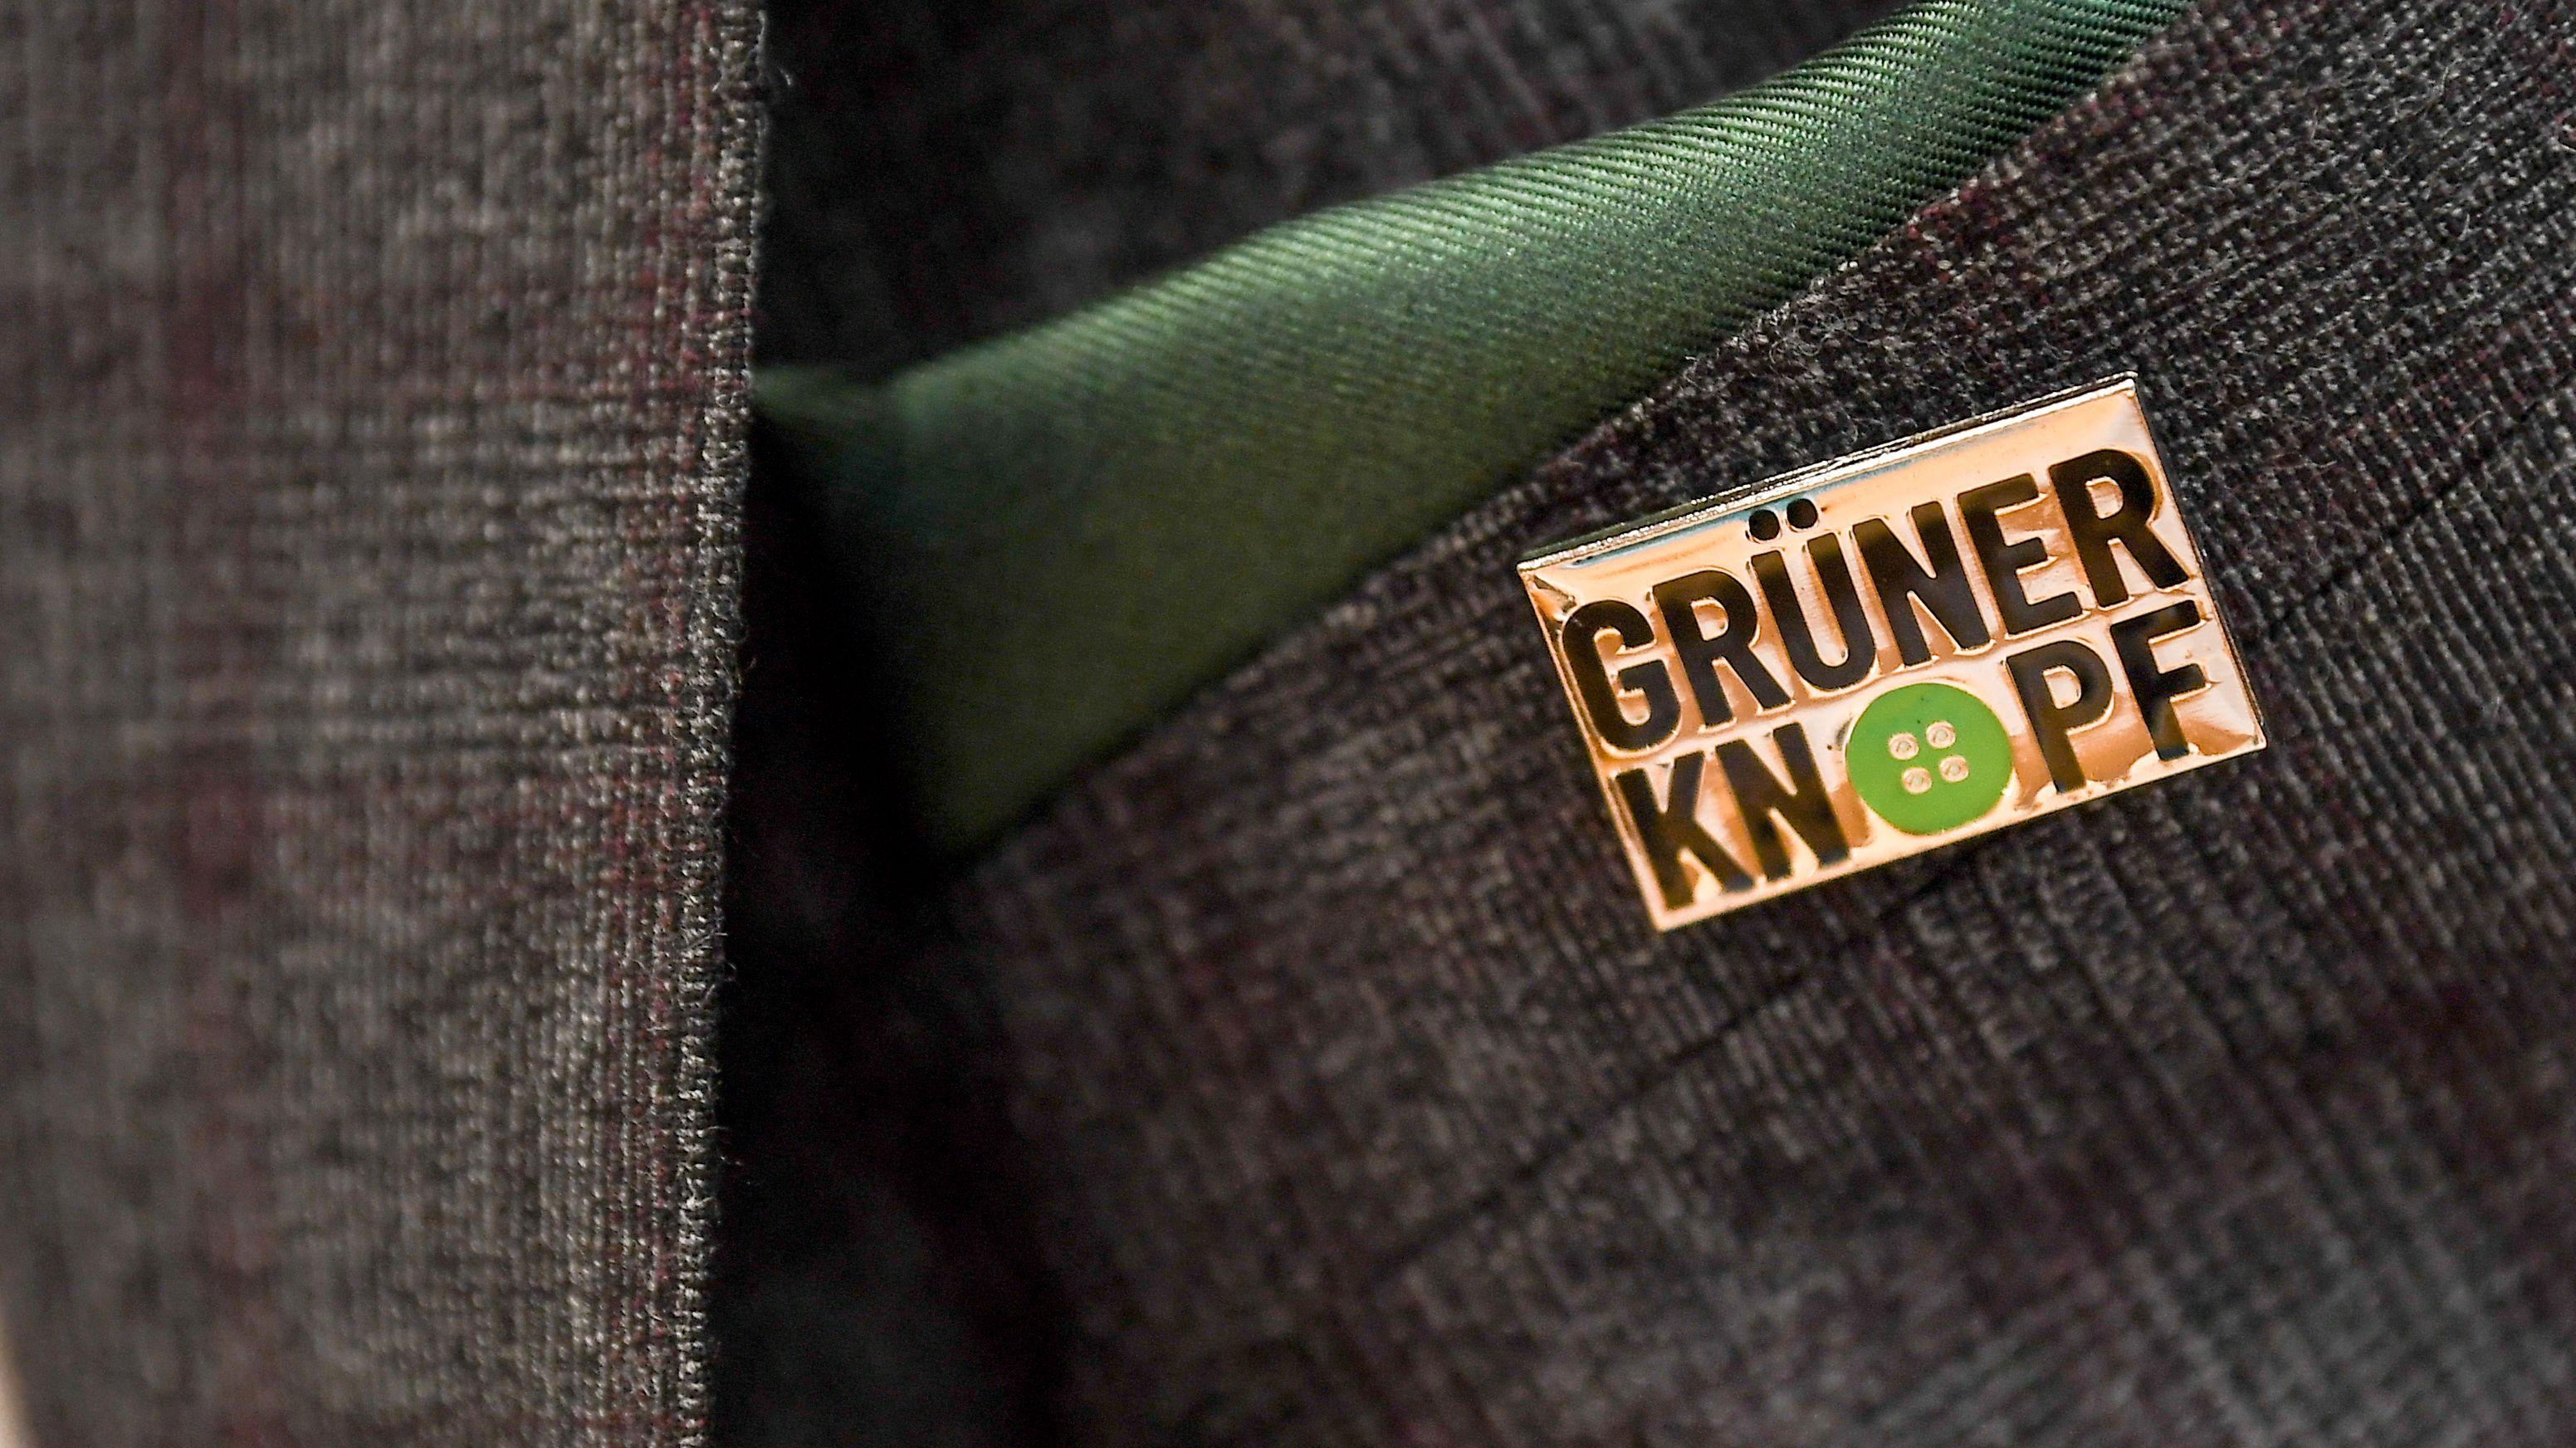 Grüner Knopf als Textilsiegel kommt